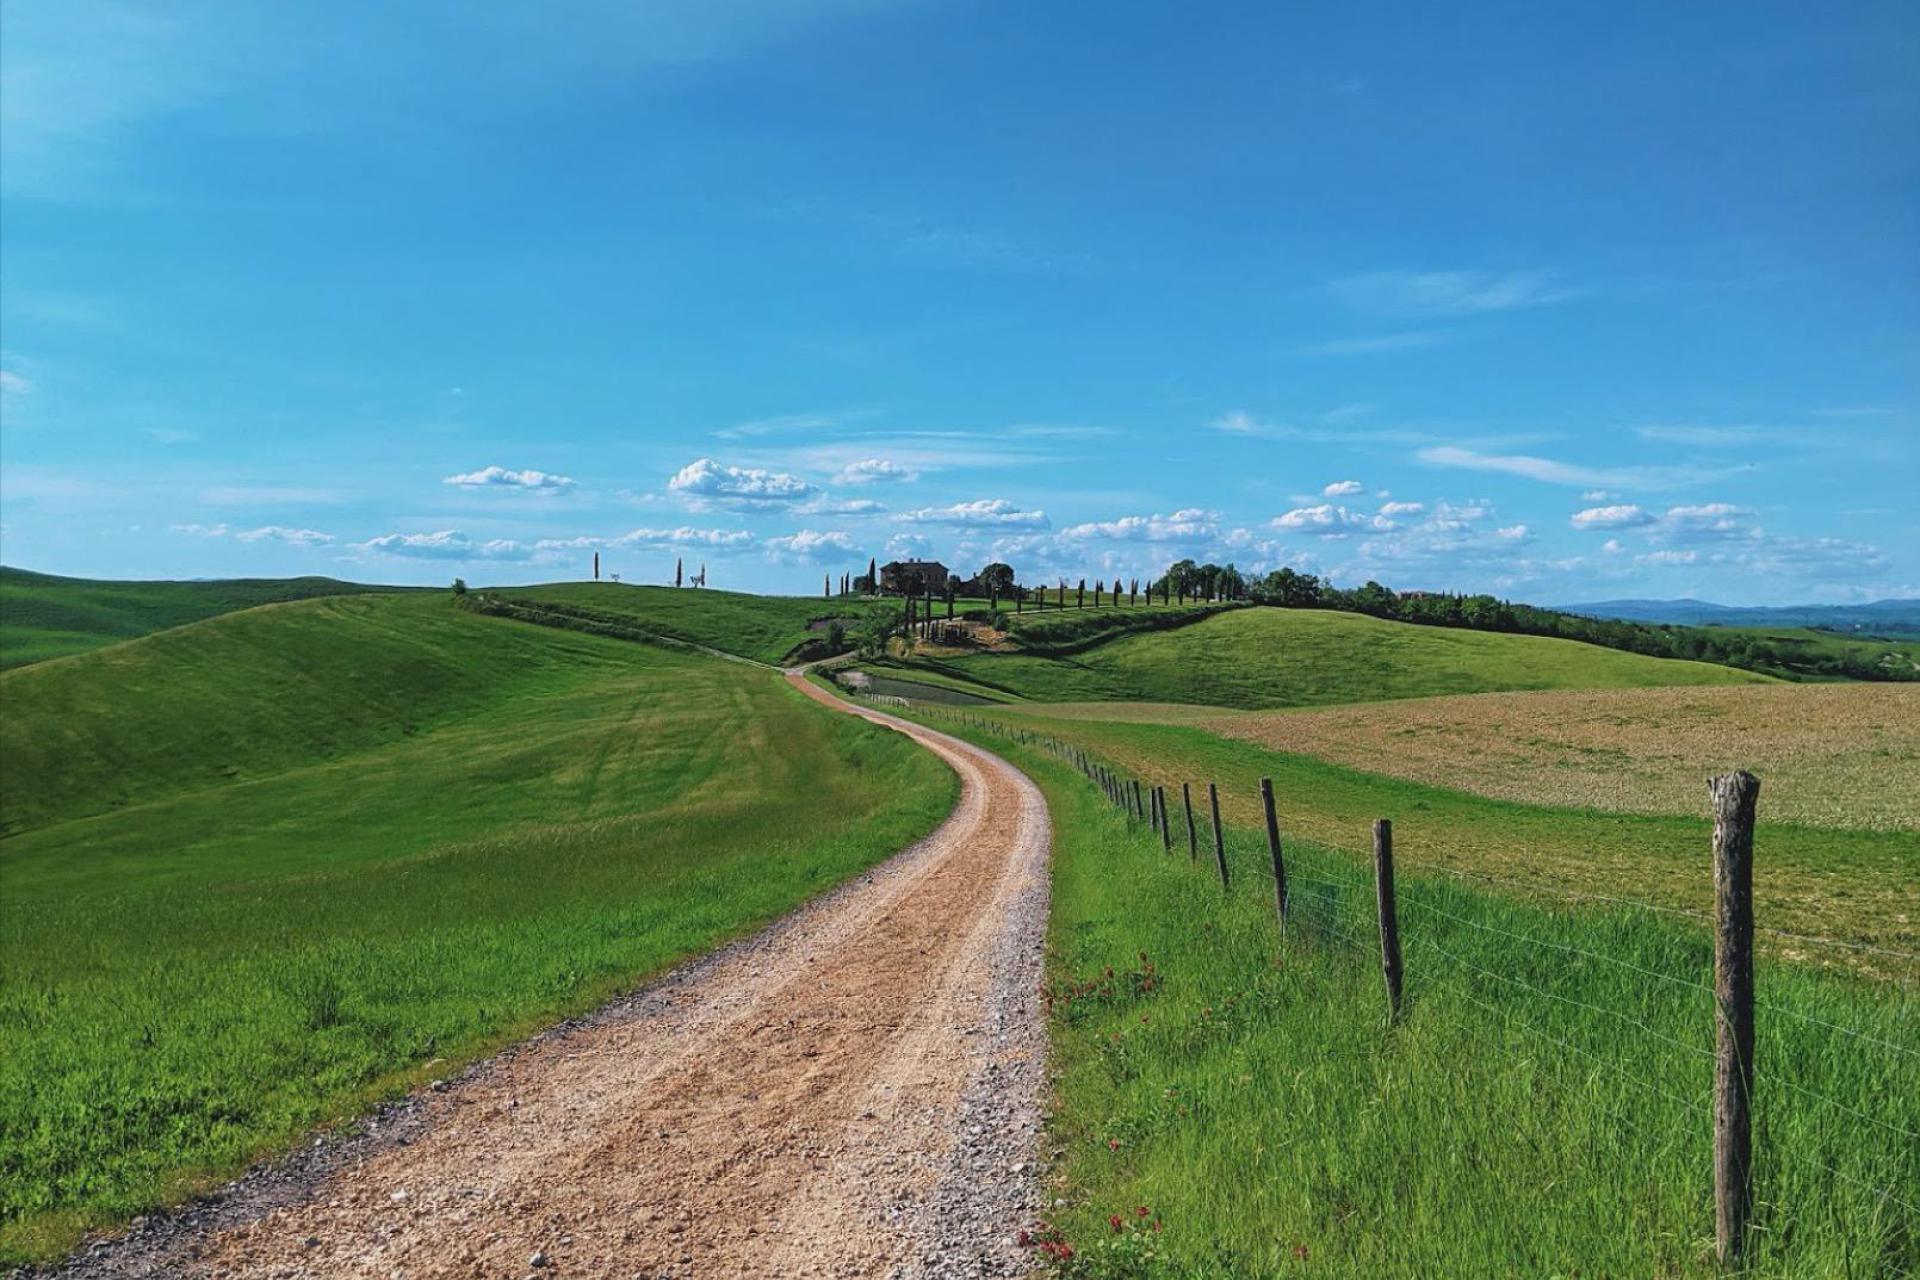 Agriturismo Toscane Kleinschalige agriturismo met uitzicht op Siena   myitaly.nl